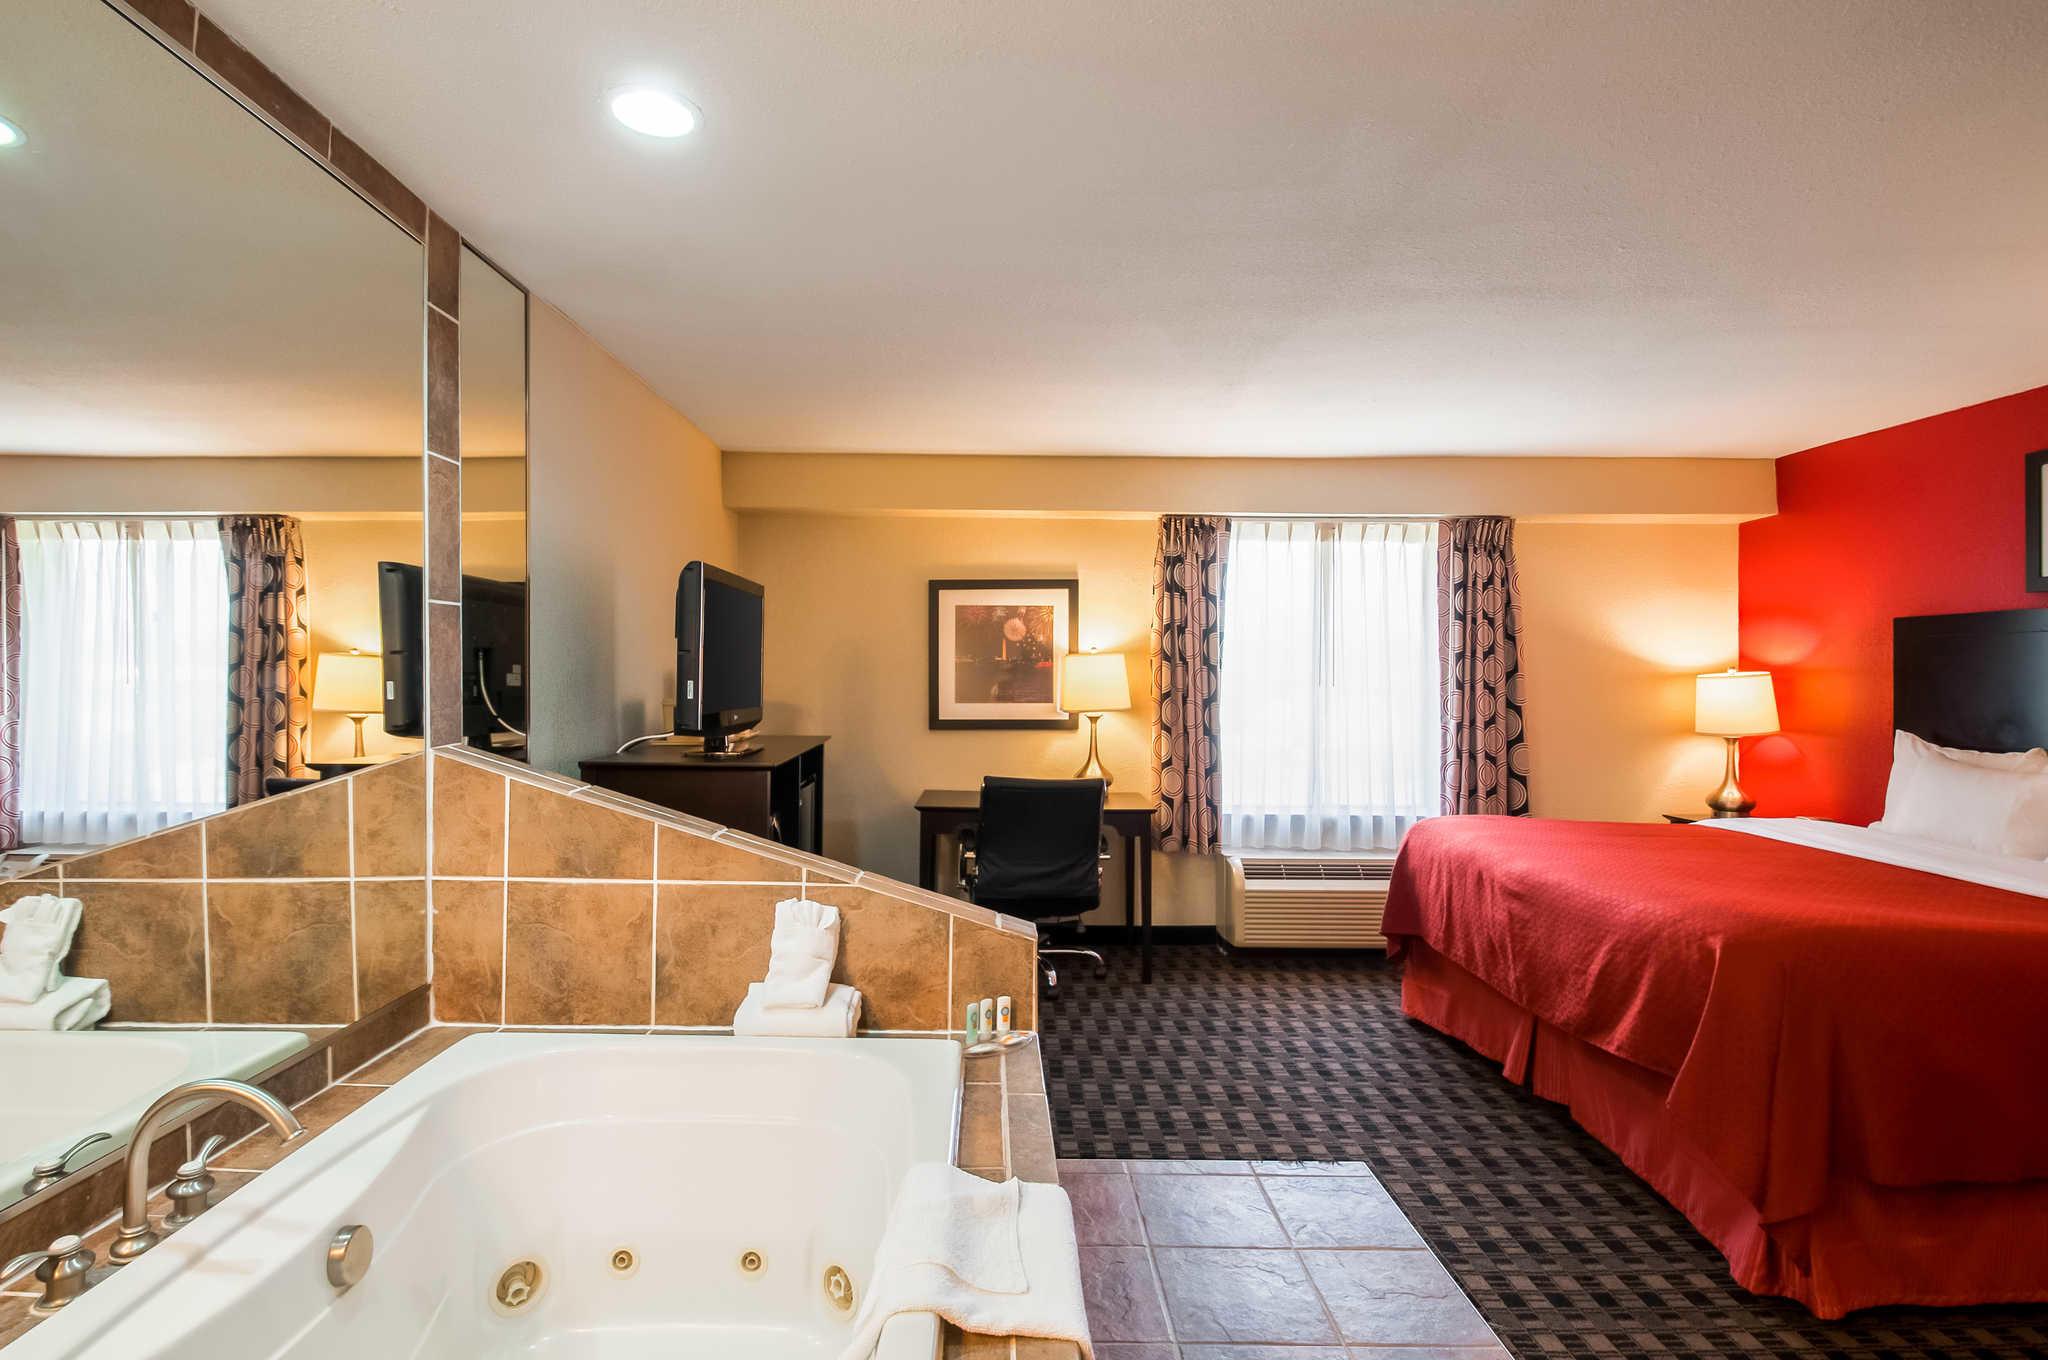 Quality Inn near Potomac Mills image 10